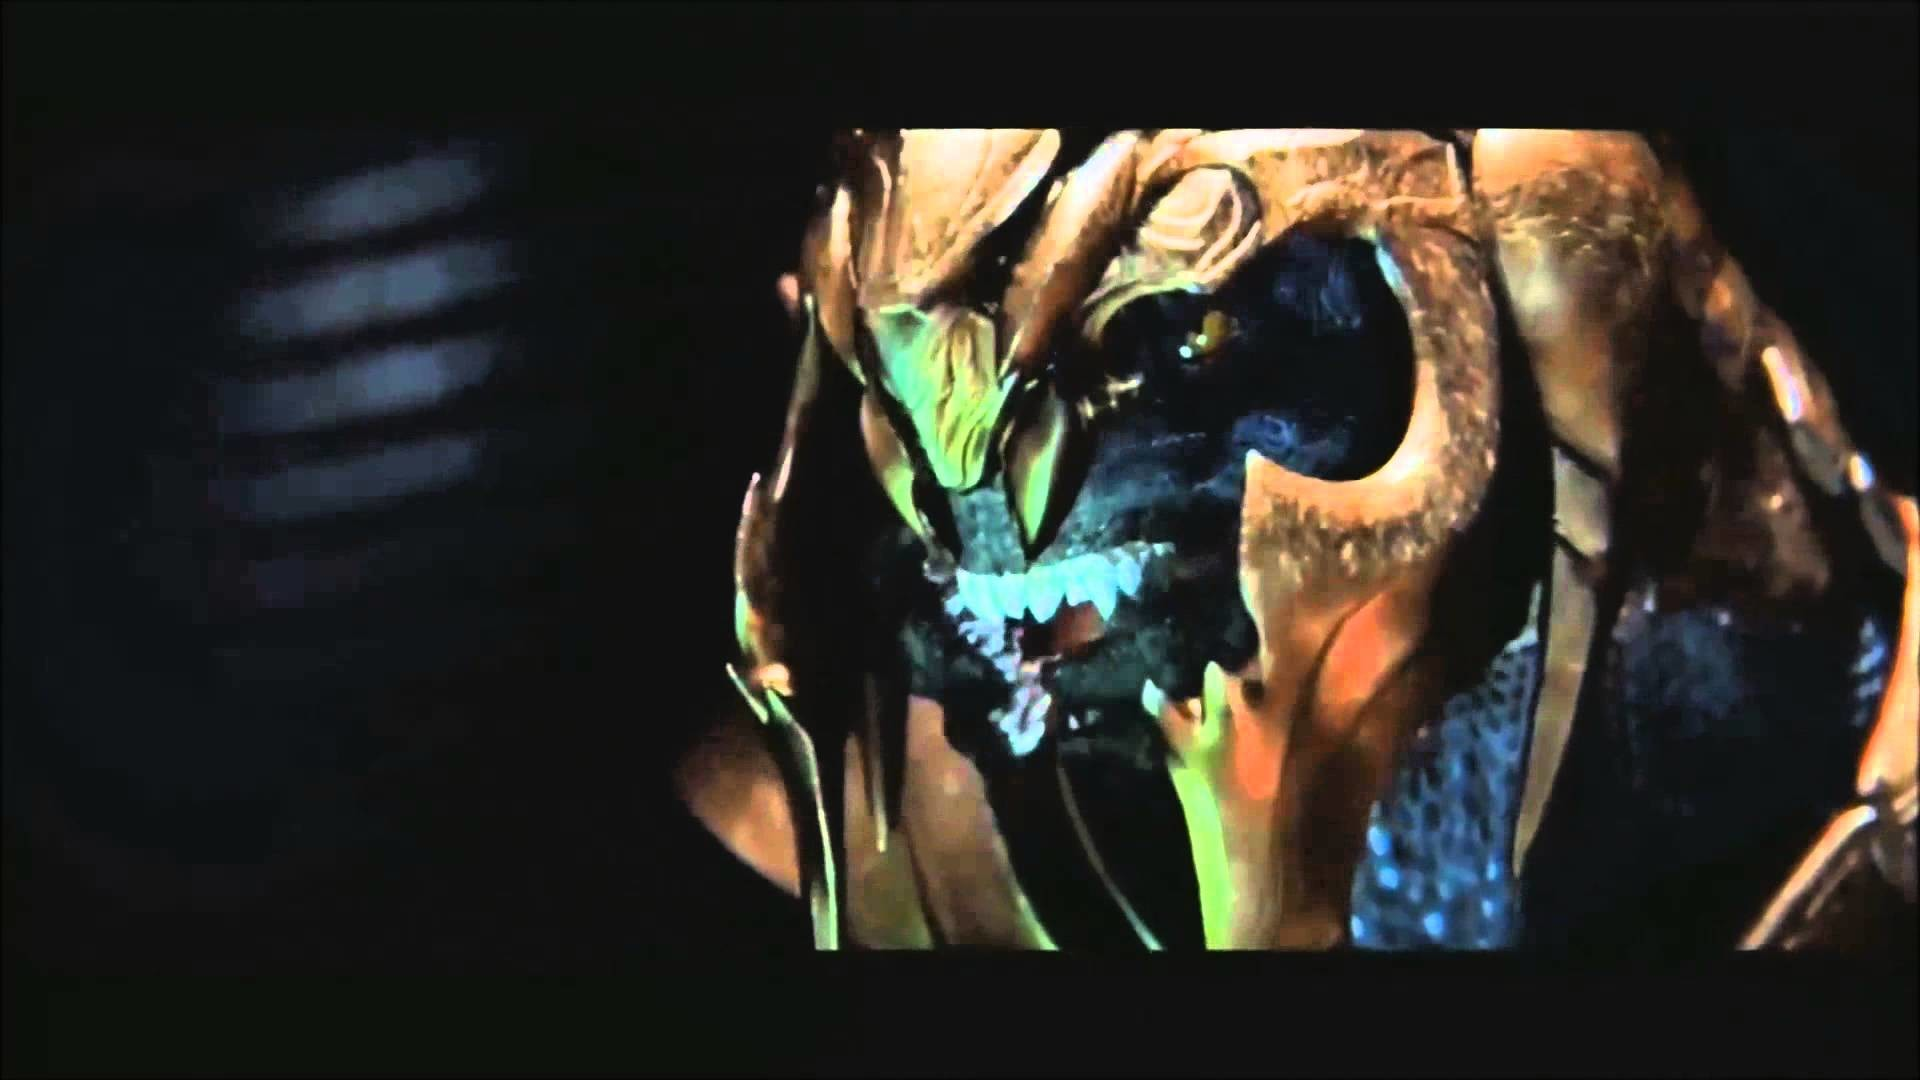 Halo 5: Guardians Leaked Arbiter Cutscene/Halo 2 Prologue HD